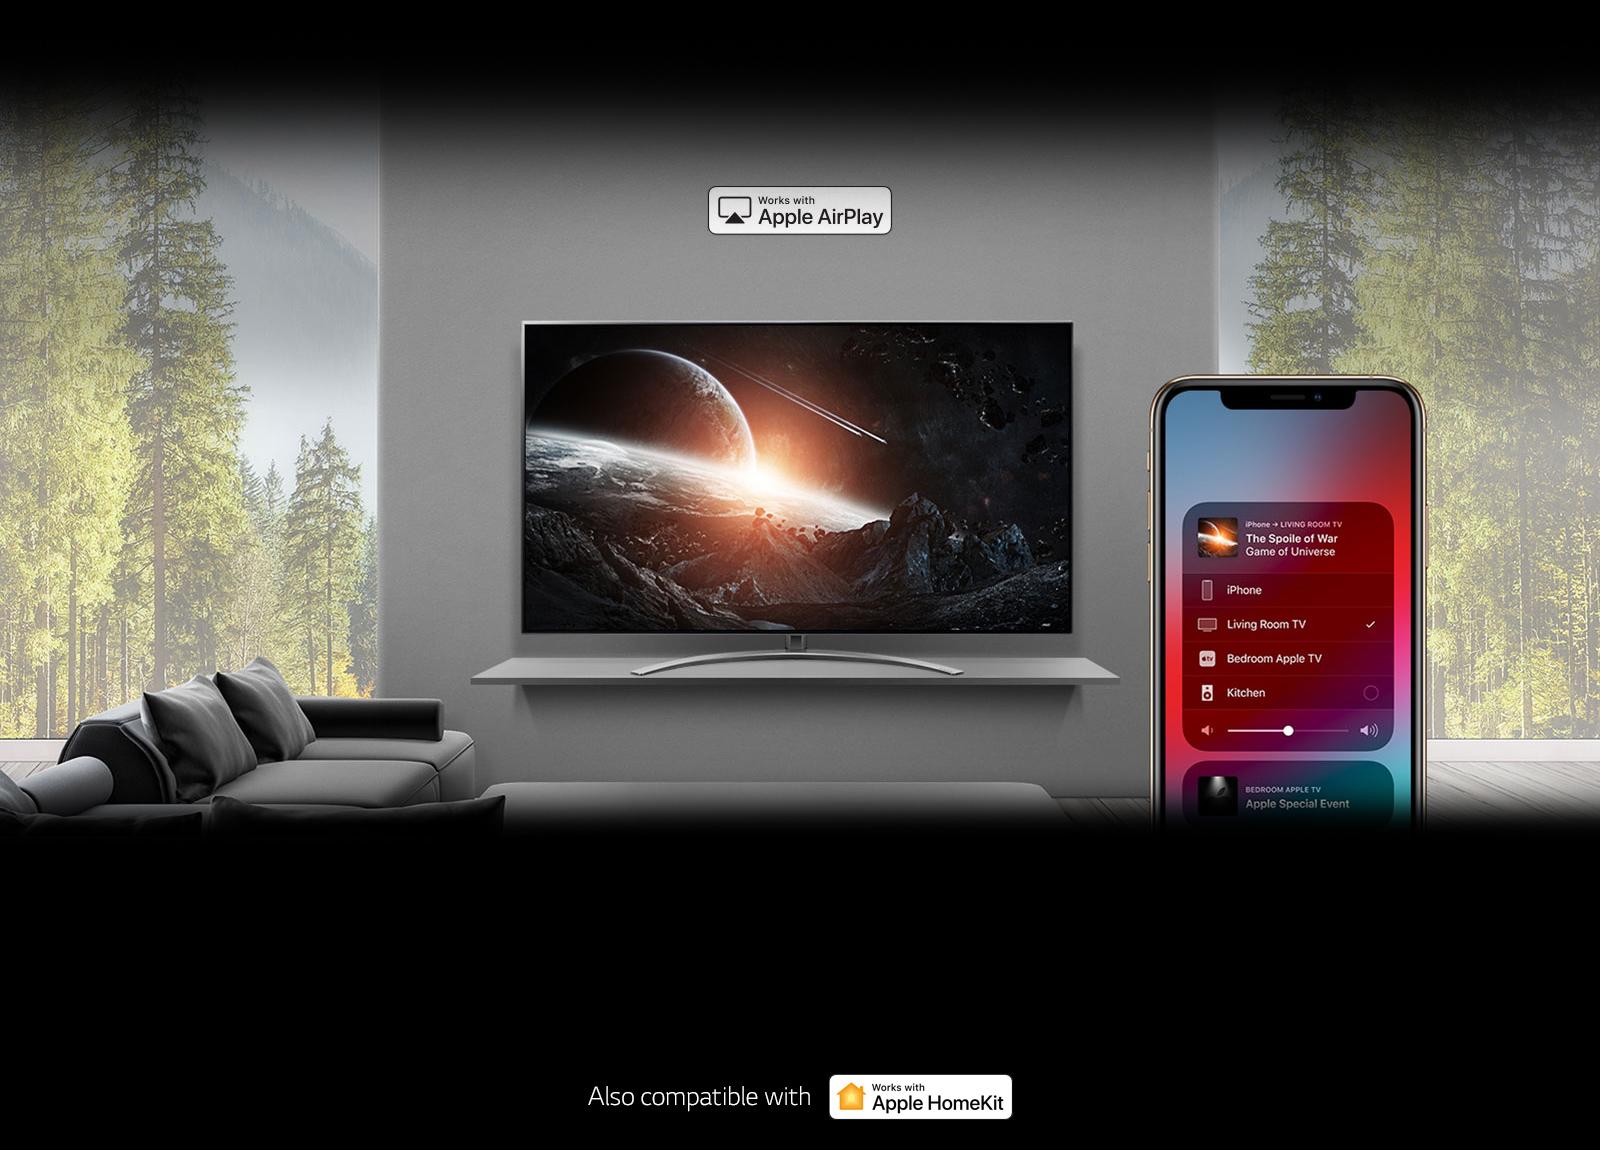 LG NanoCell TV AirPlay